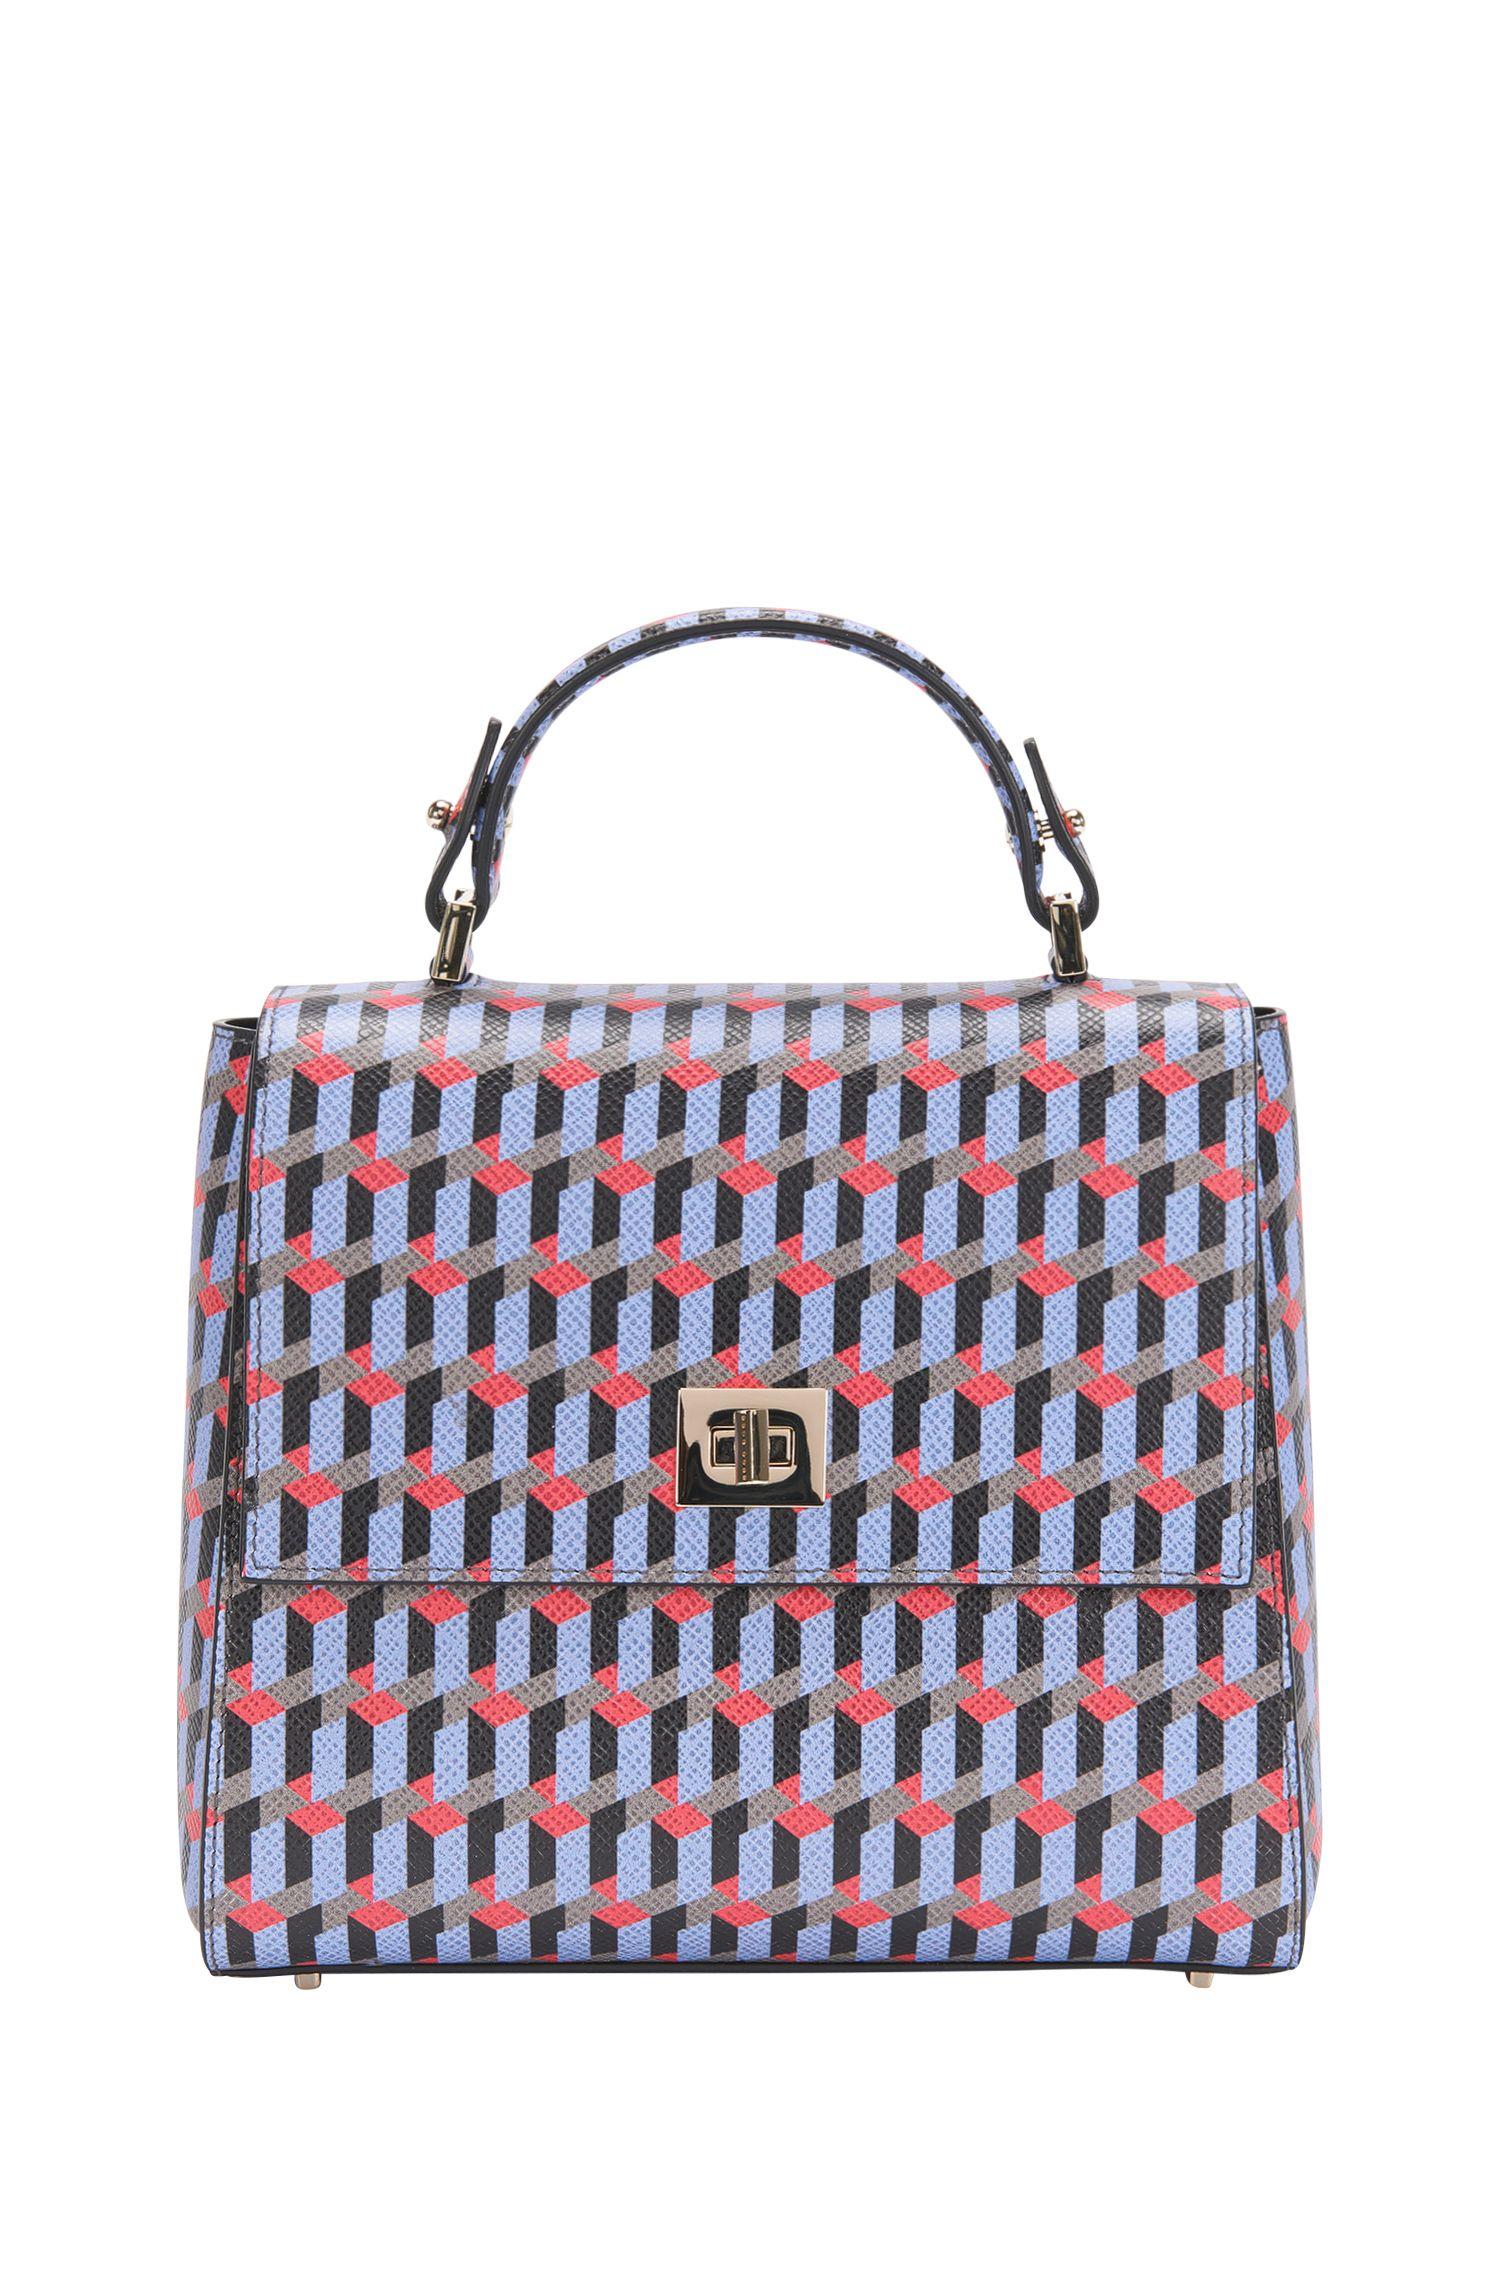 'Bespoke TH S FP' | Calfskin Printed Bag, Detachable Strap